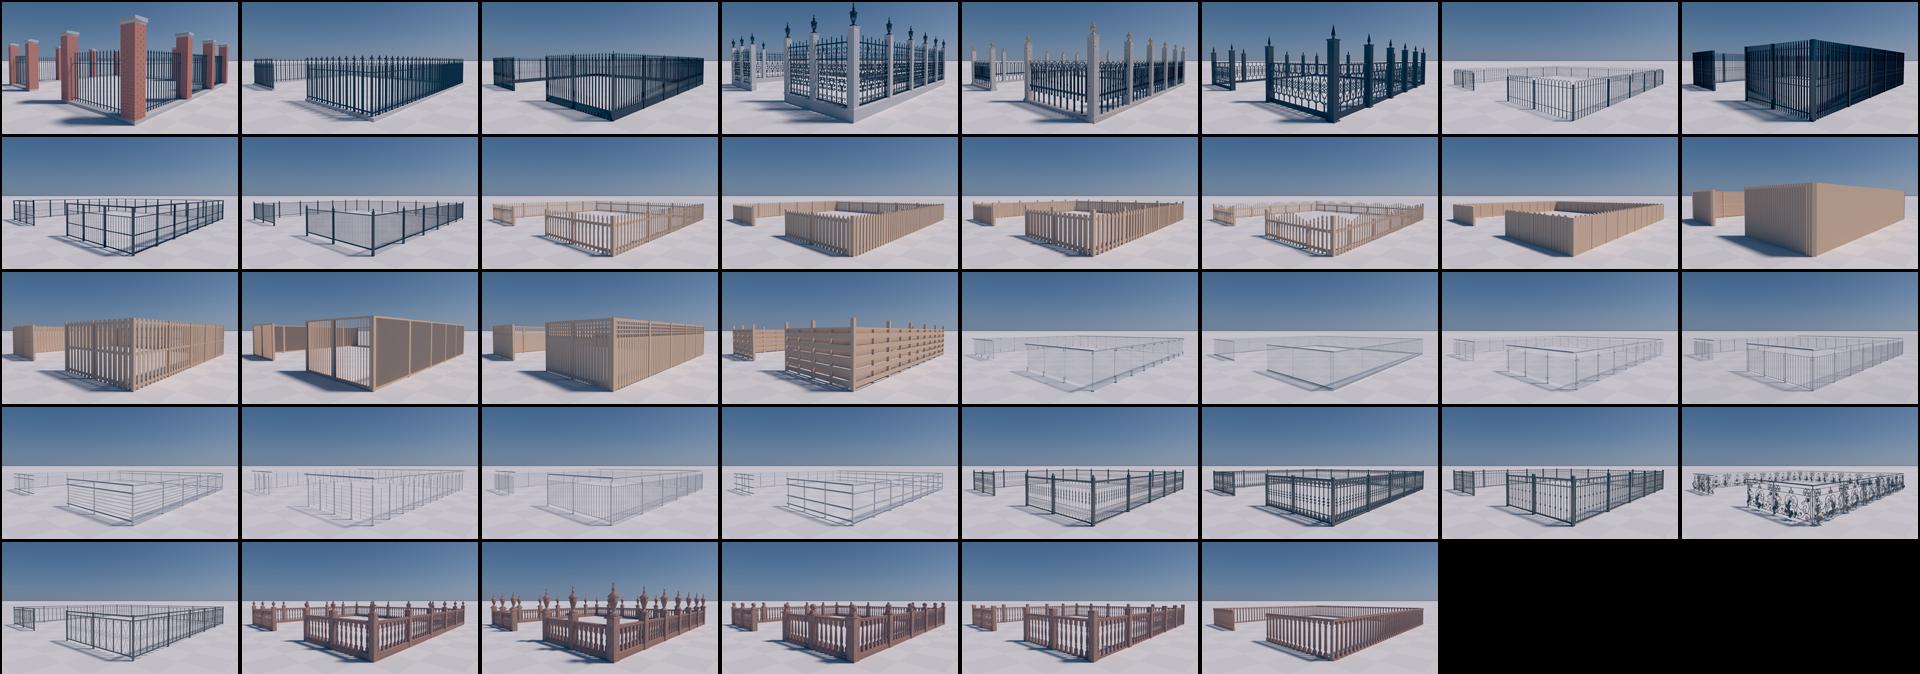 SiClone fence sample models.